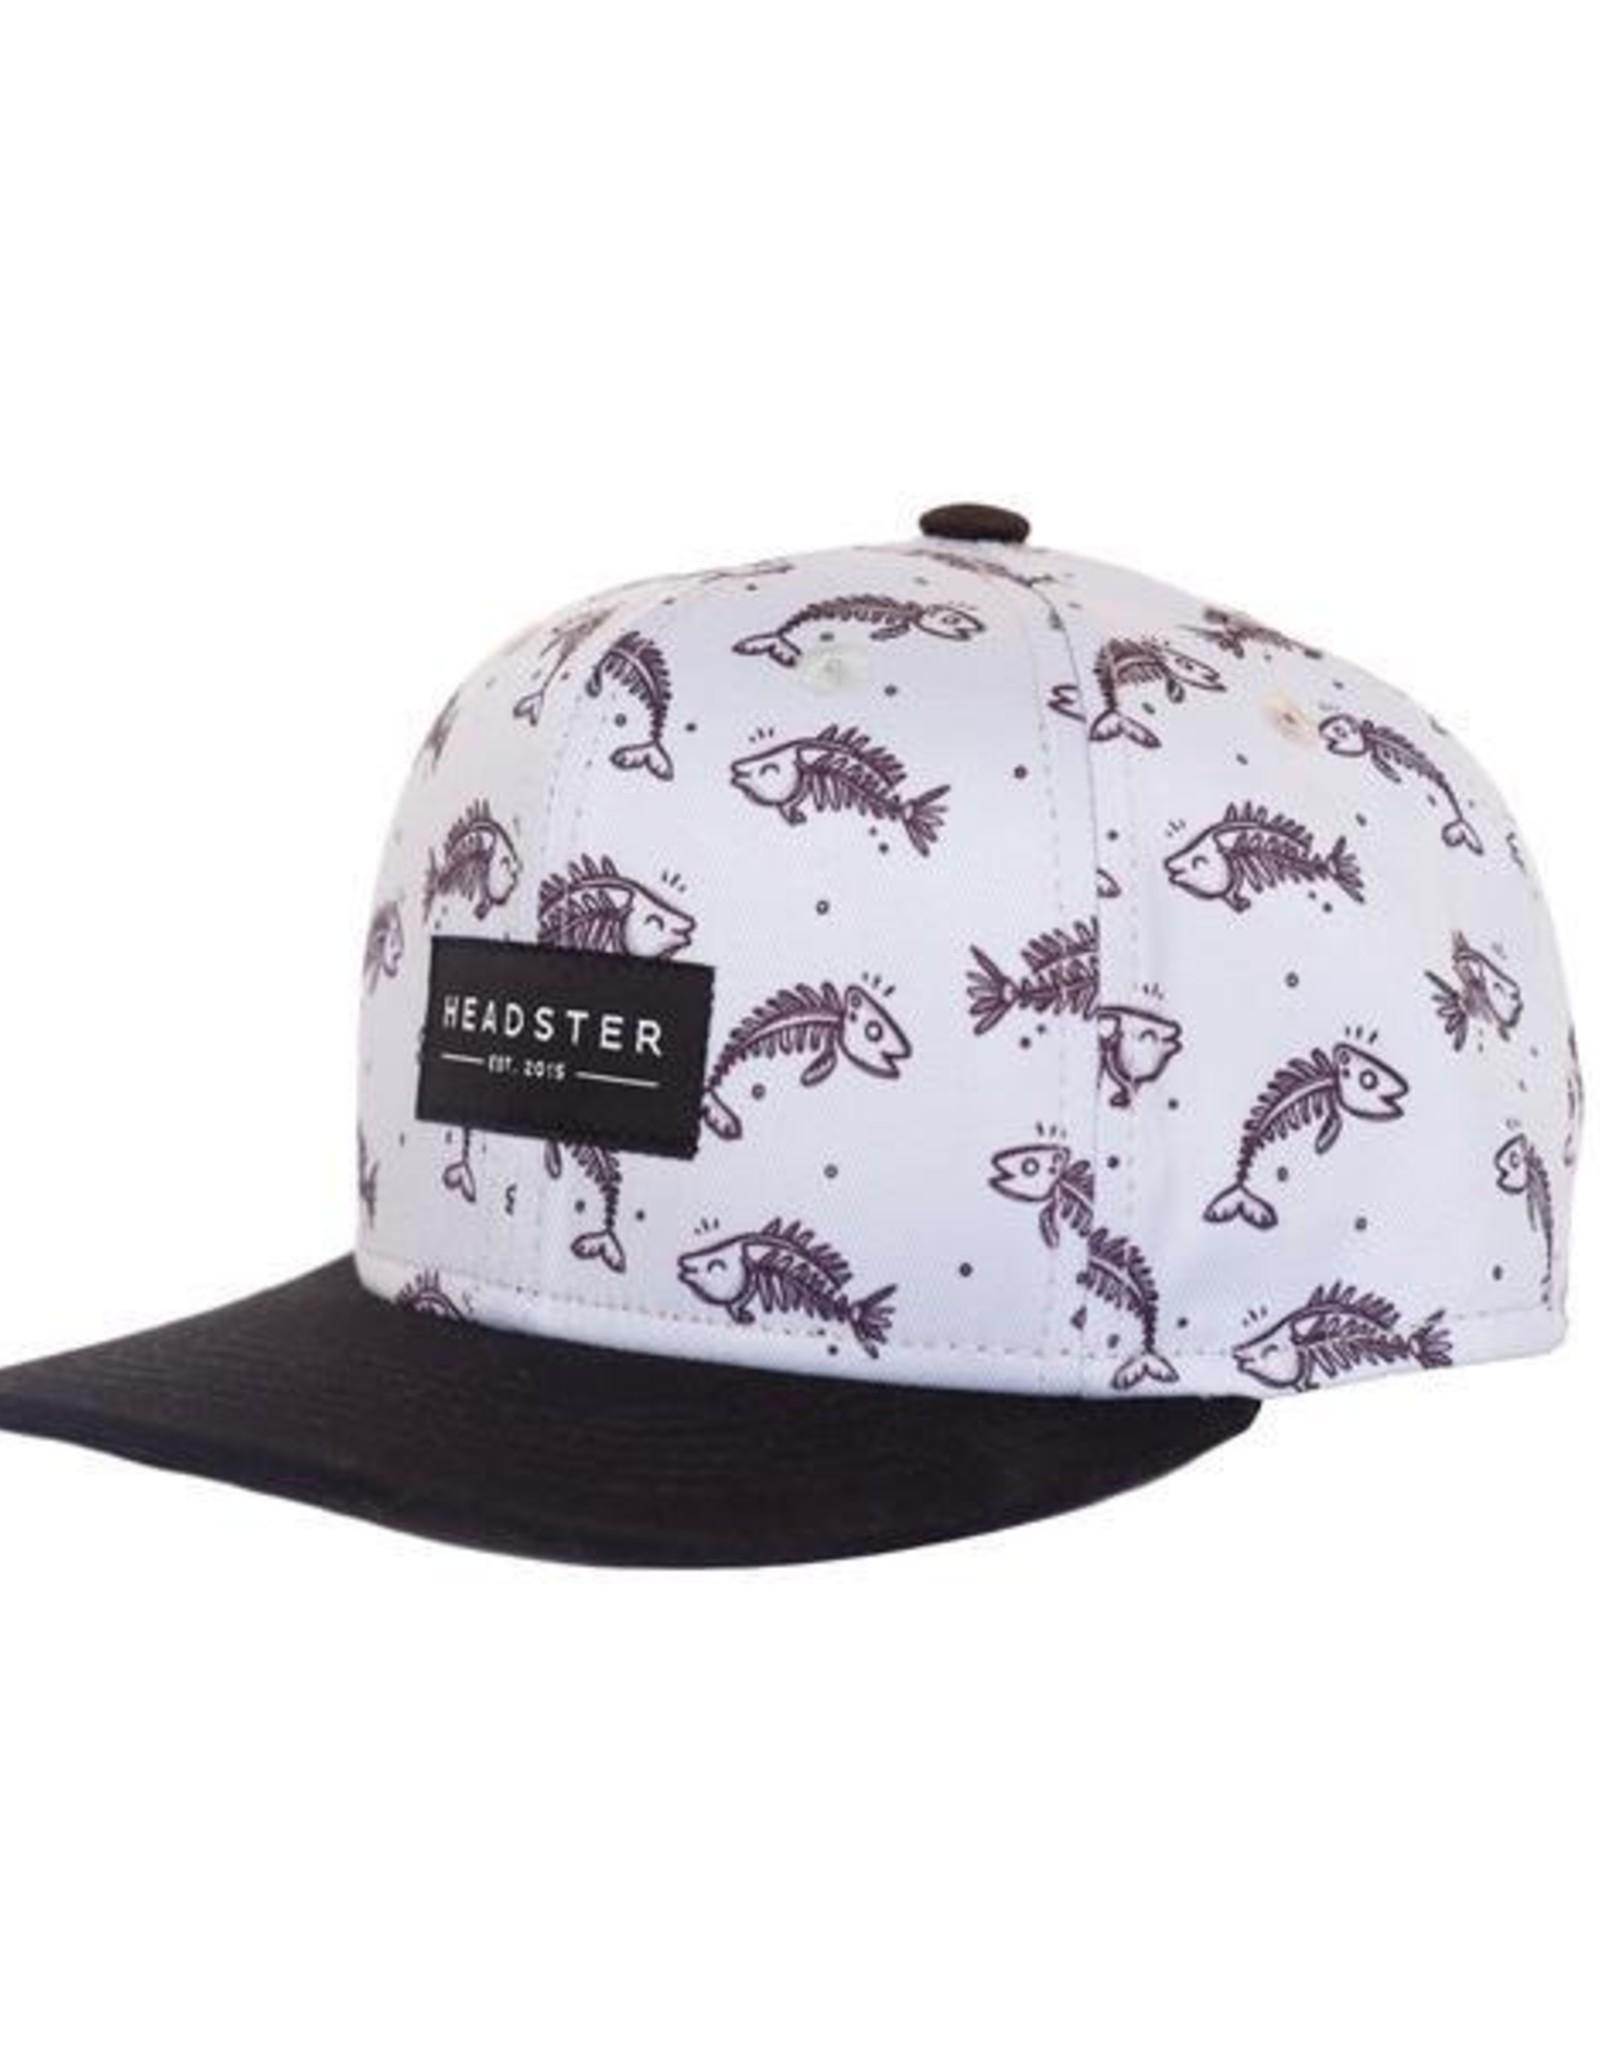 Headster Kids Fishbone ball cap